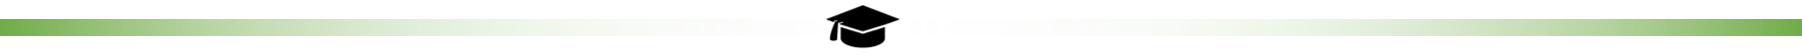 separador-temas-tuplaza-web